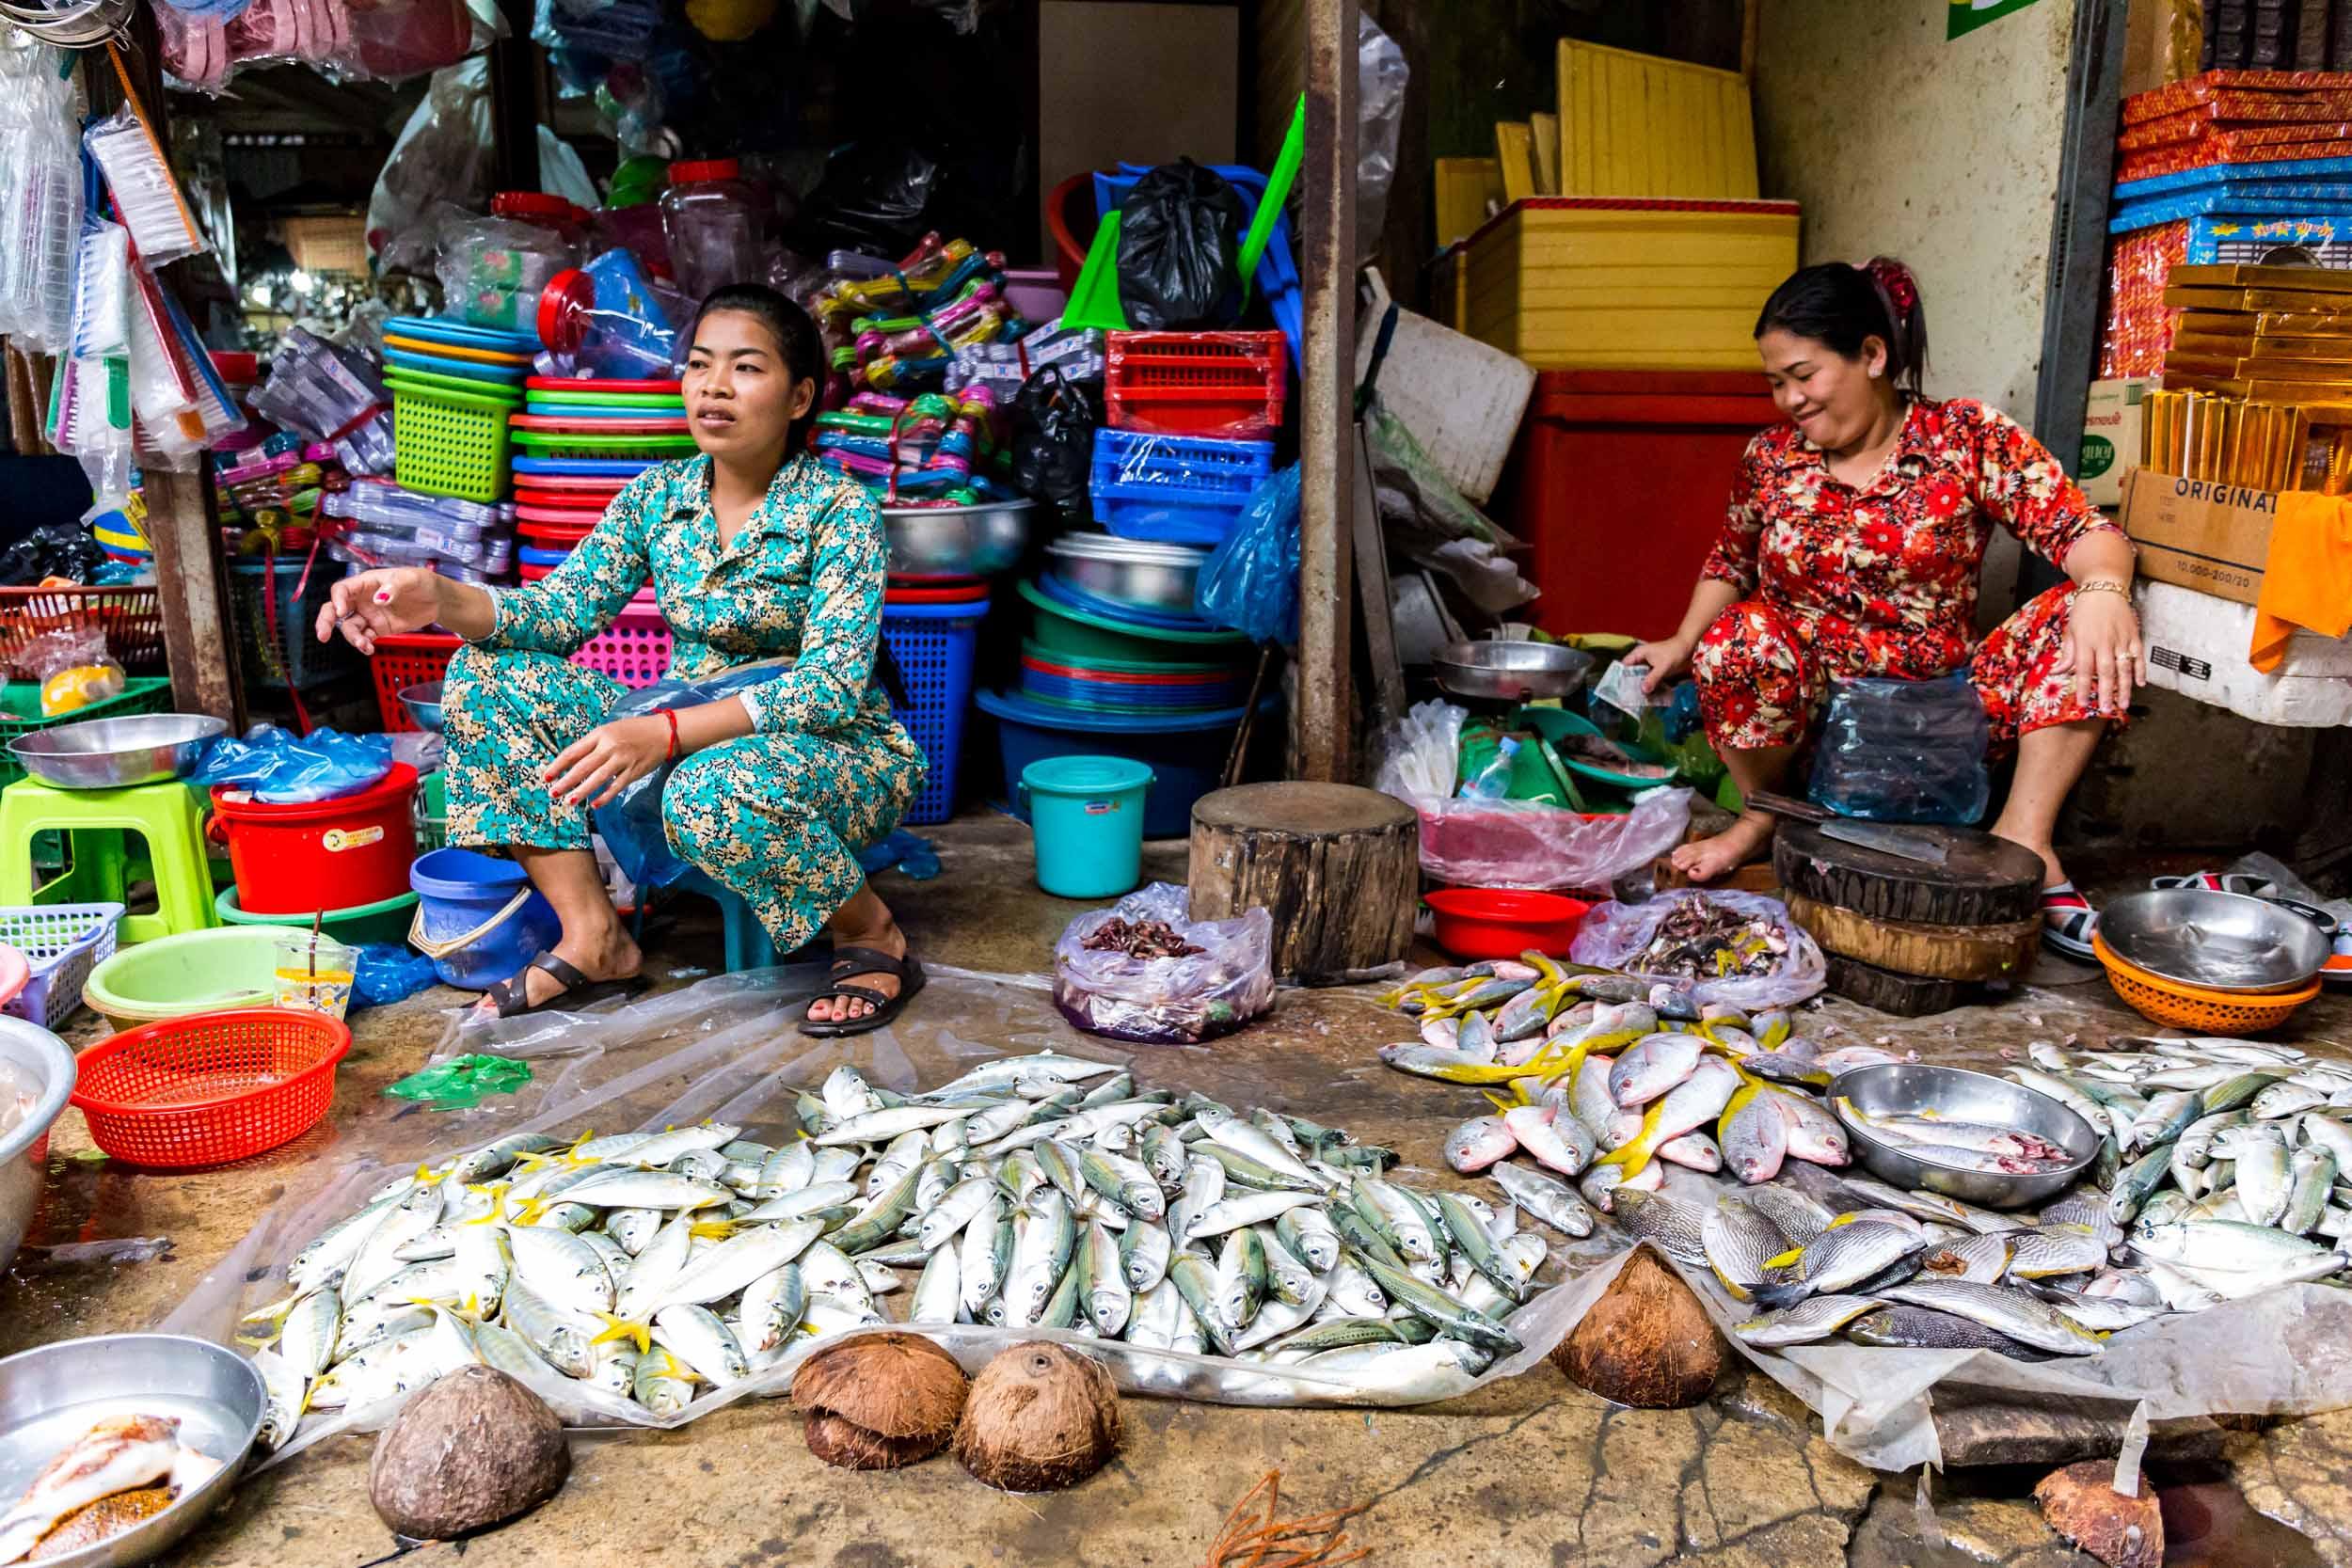 Local Market Stall, Sihanoukville, Cambodia.